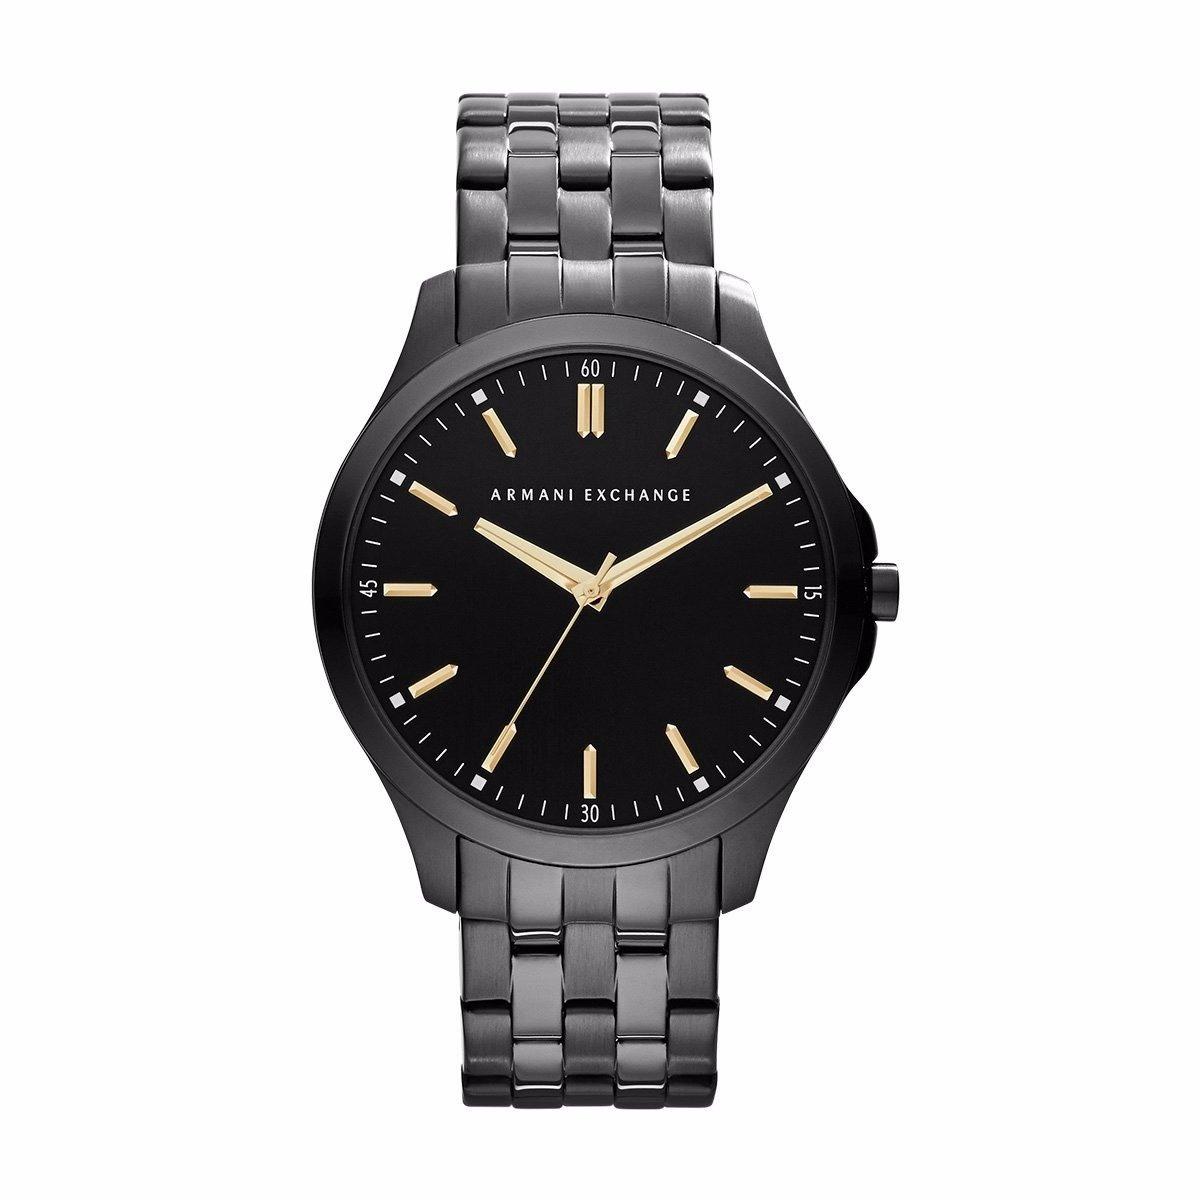 a62684b62dc1 reloj armani exchange ax2144 acero negro paracaballero. Cargando zoom.